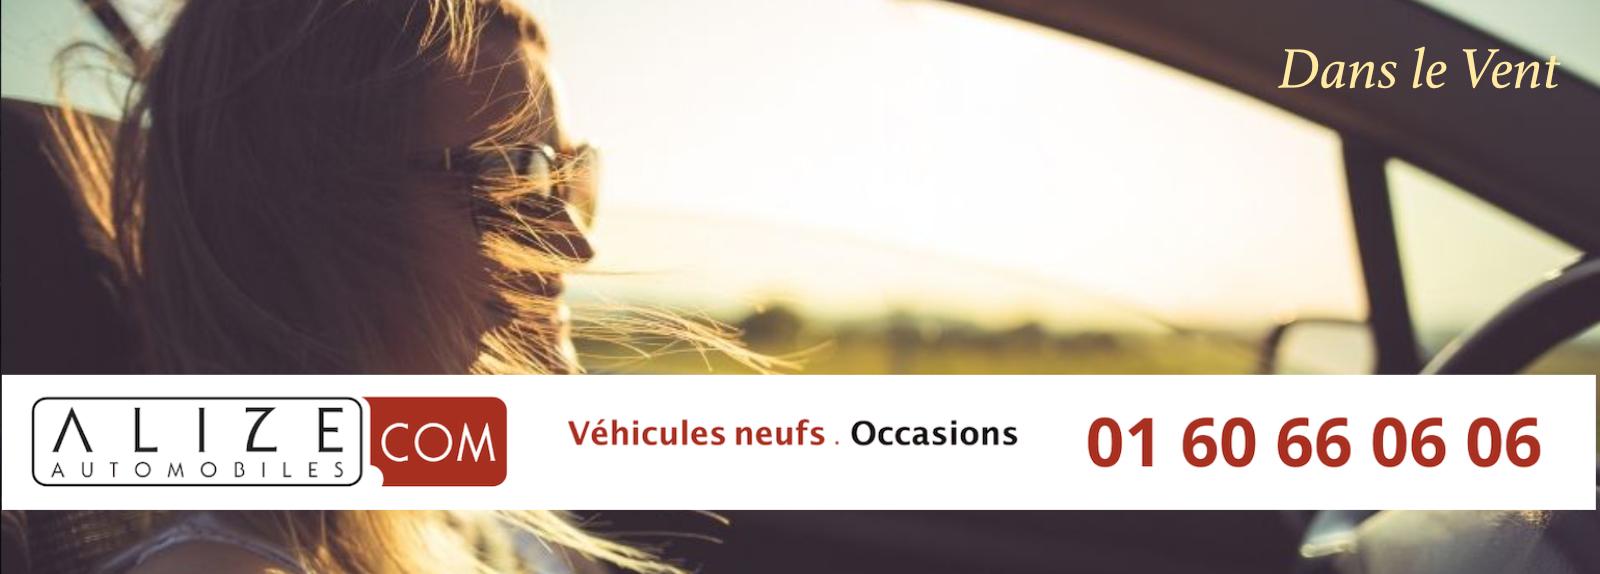 Cabriolet occasion Alizé Automobiles